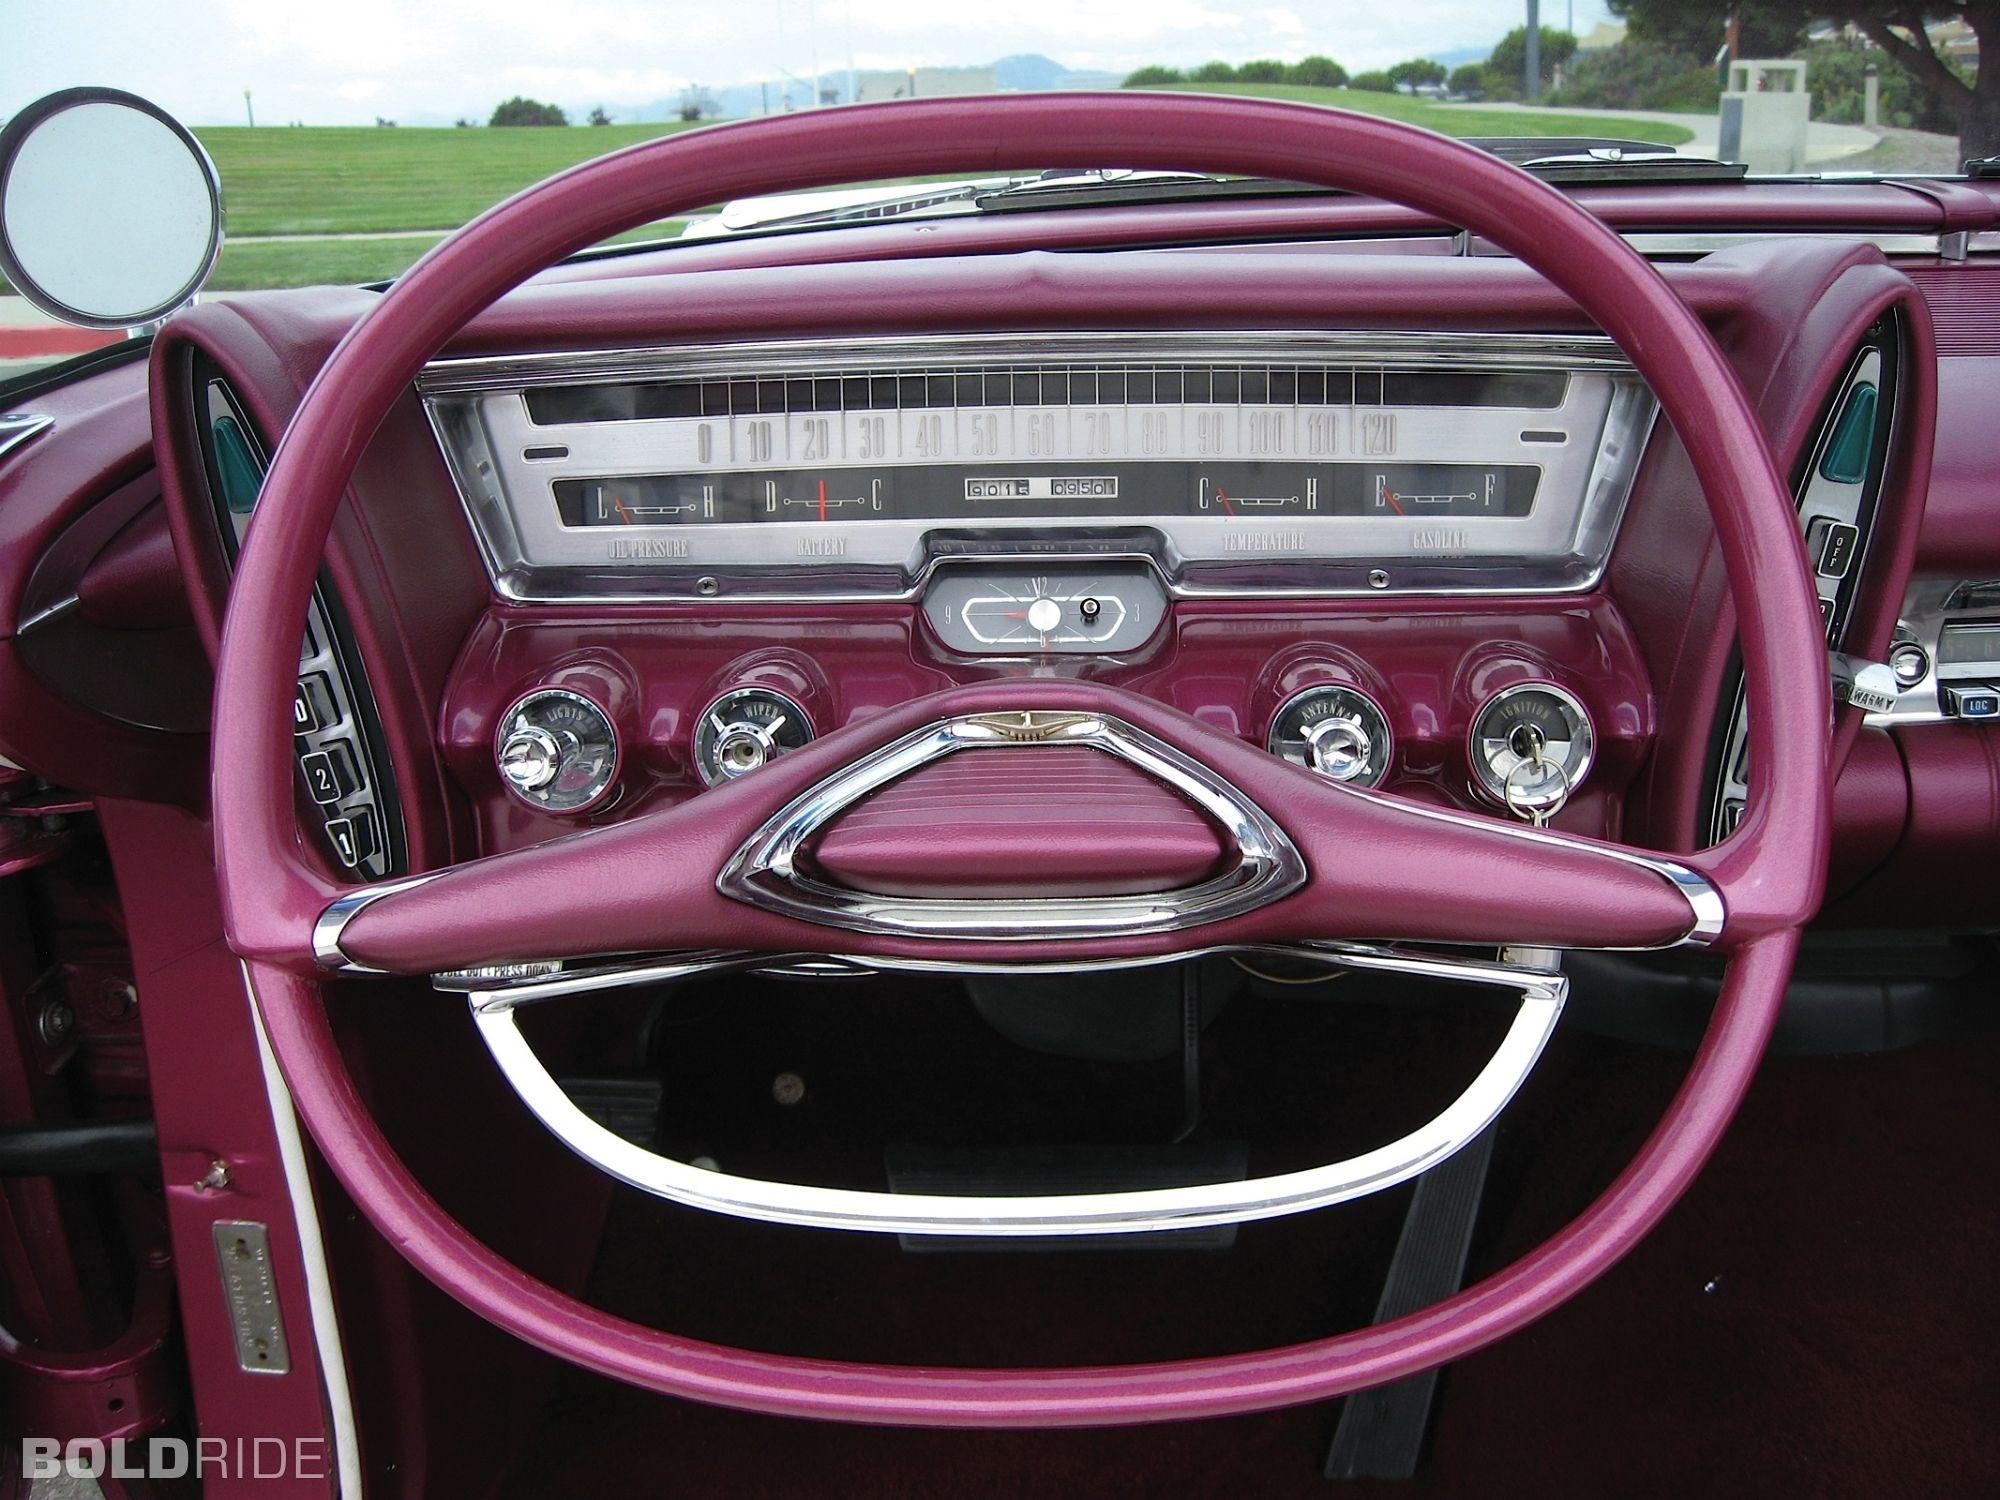 1956 chrysler imperial interior images - Http C Images Boldride Com Chrysler 1961